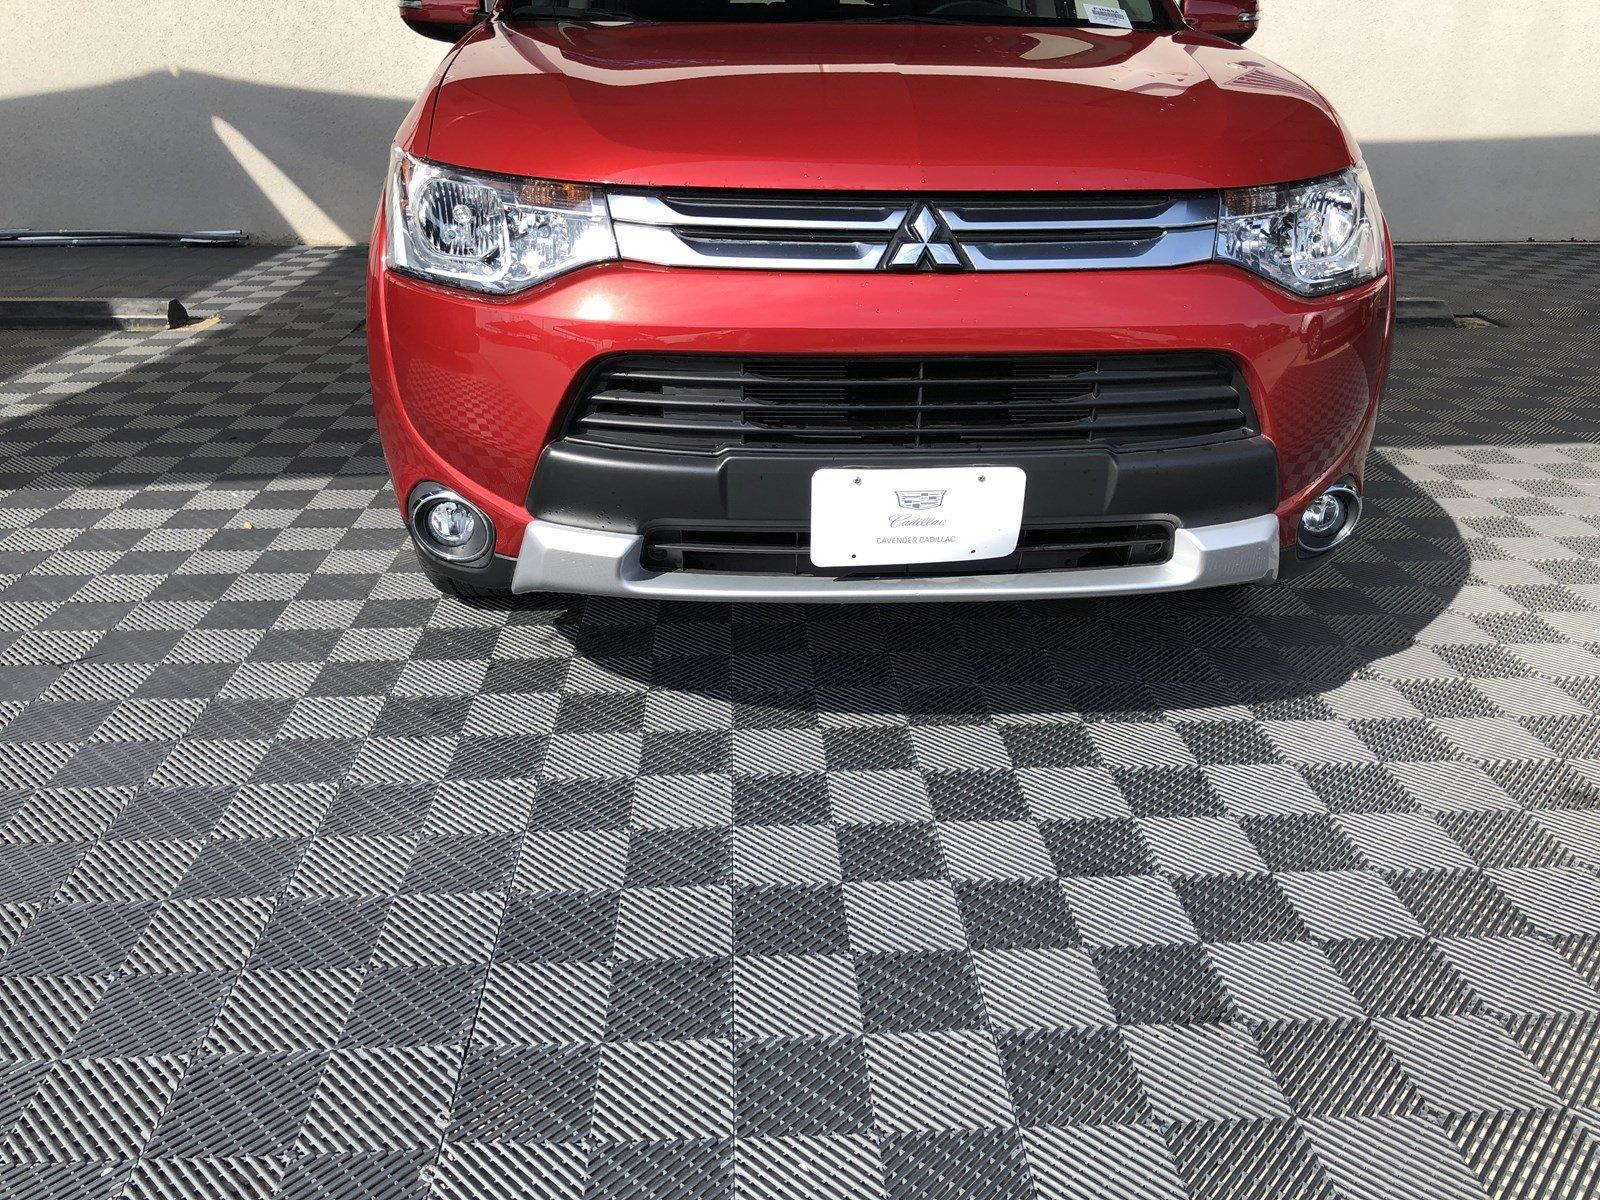 Used 2015 Mitsubishi Outlander For Sale at Cavender Pre-Owned | VIN